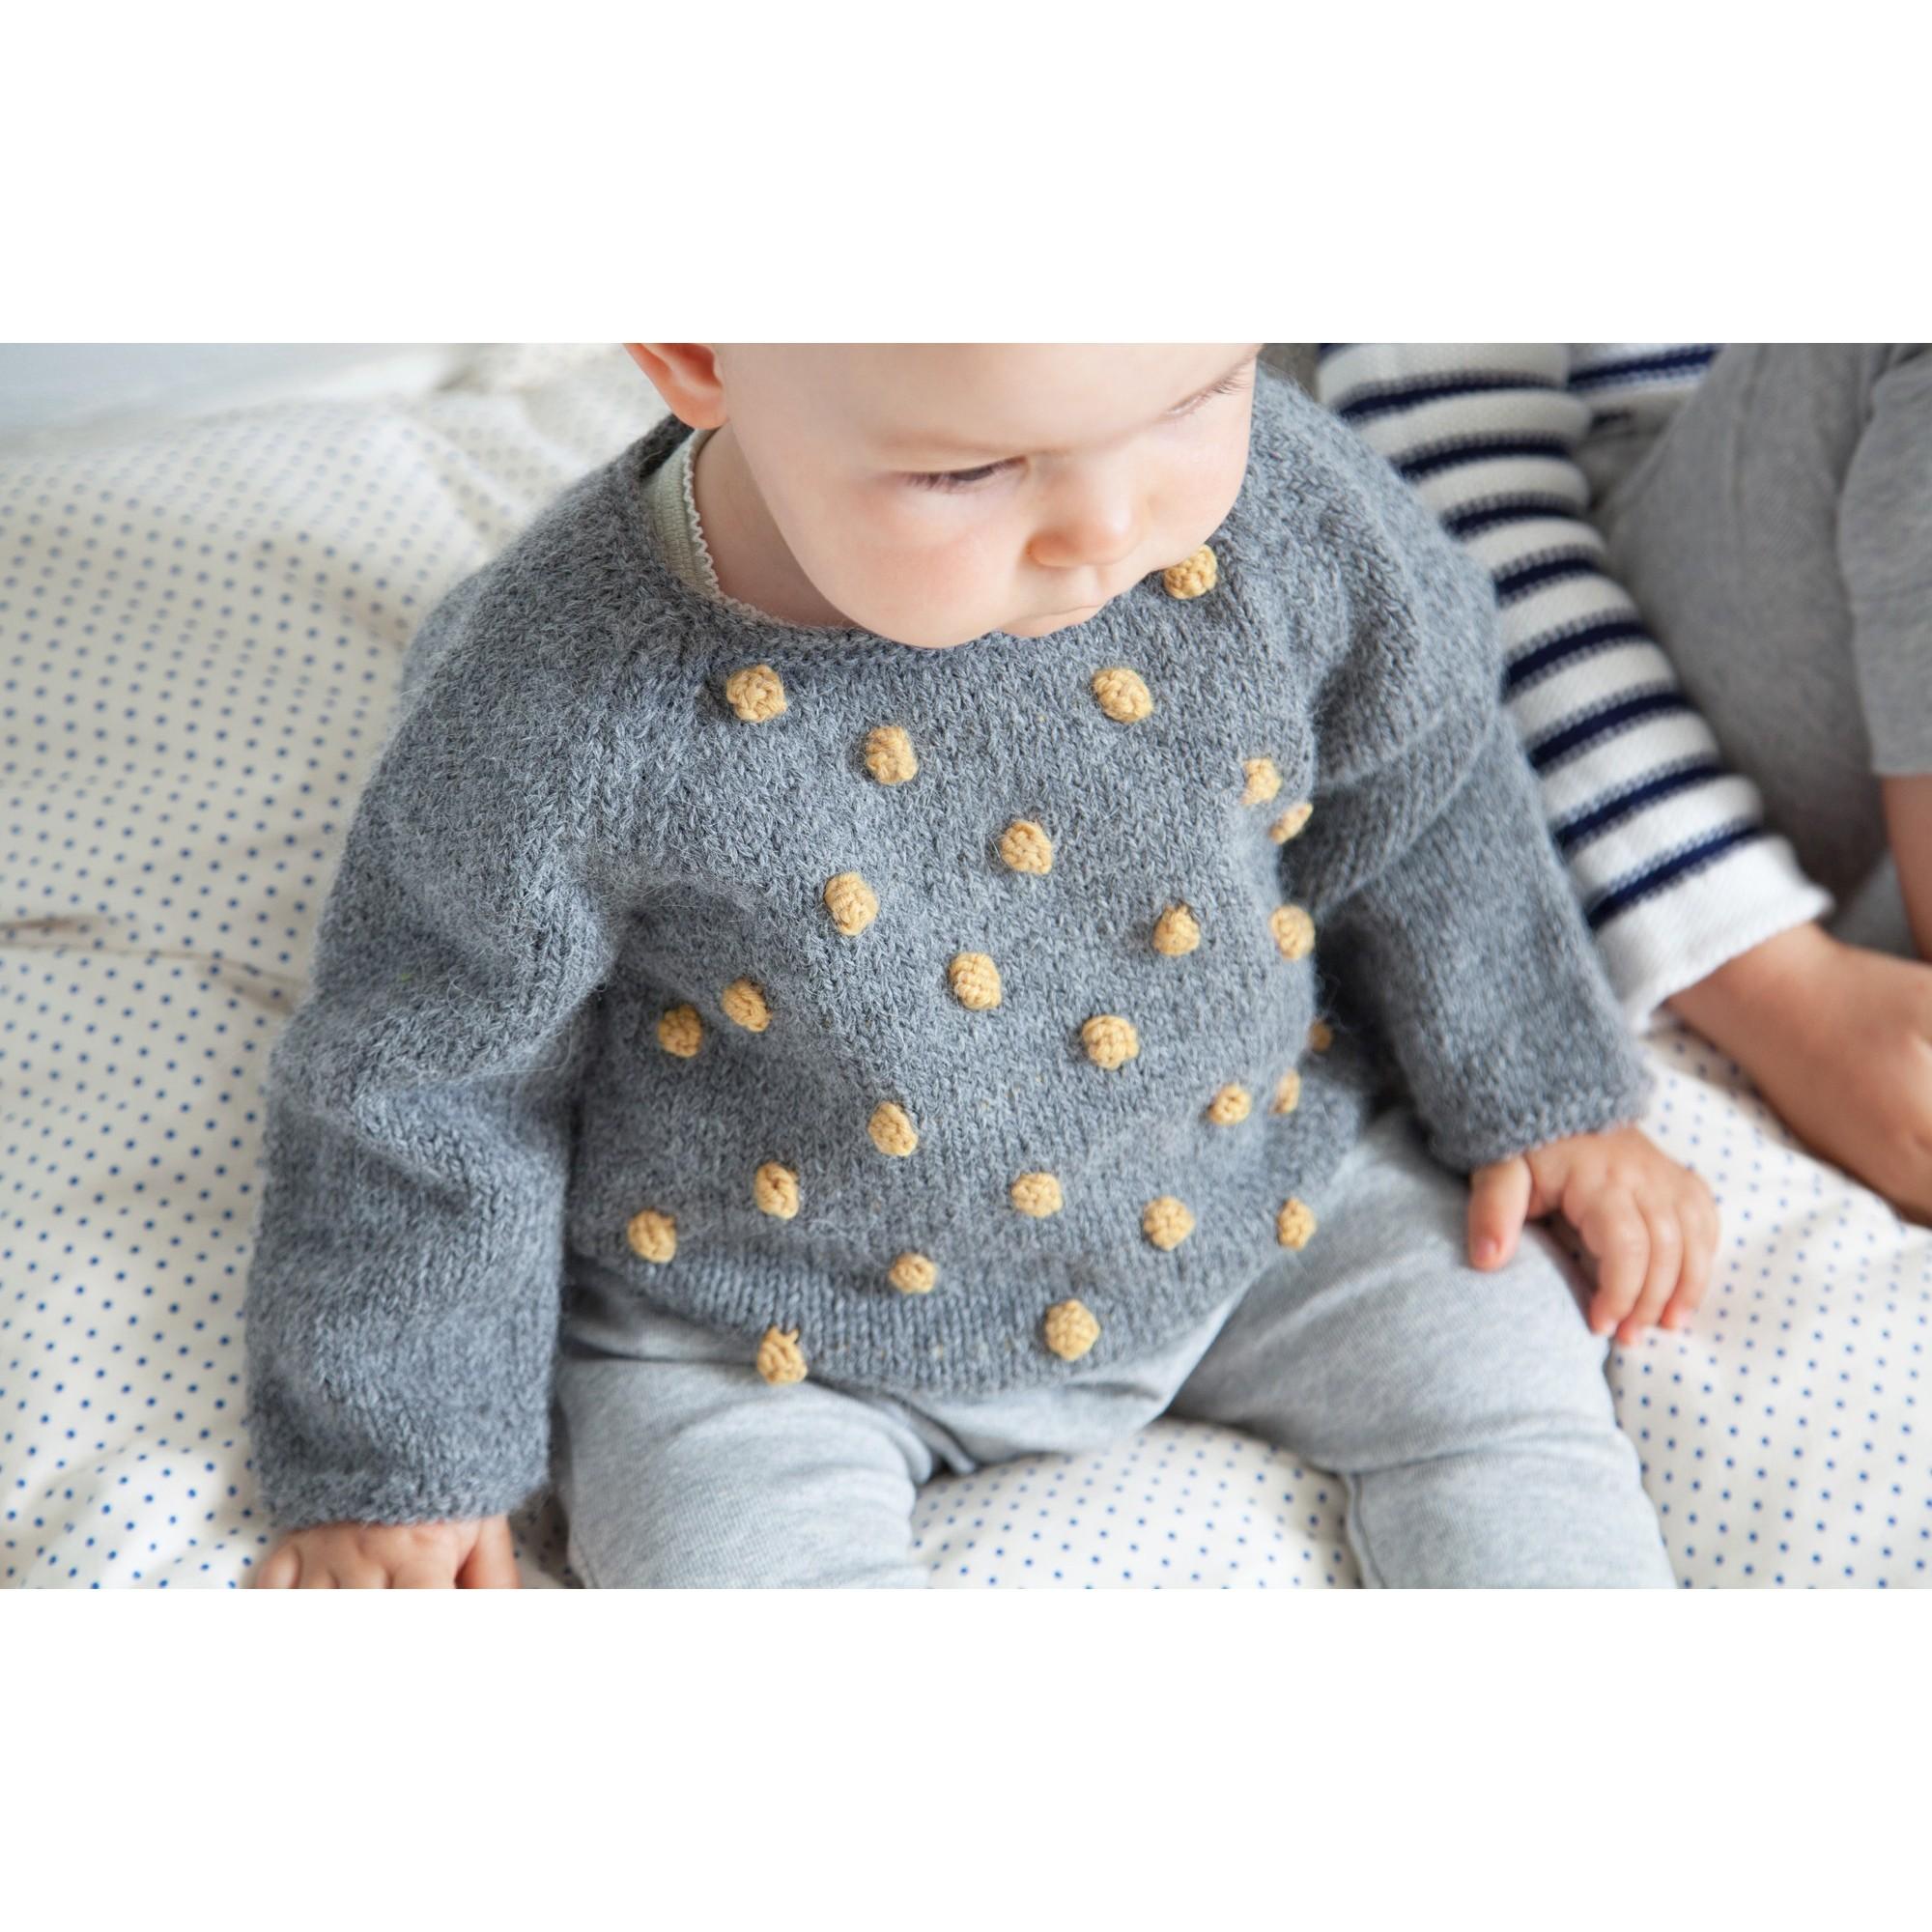 Pull Eugène bébé gris nopes jaune laine alpaga porté 2